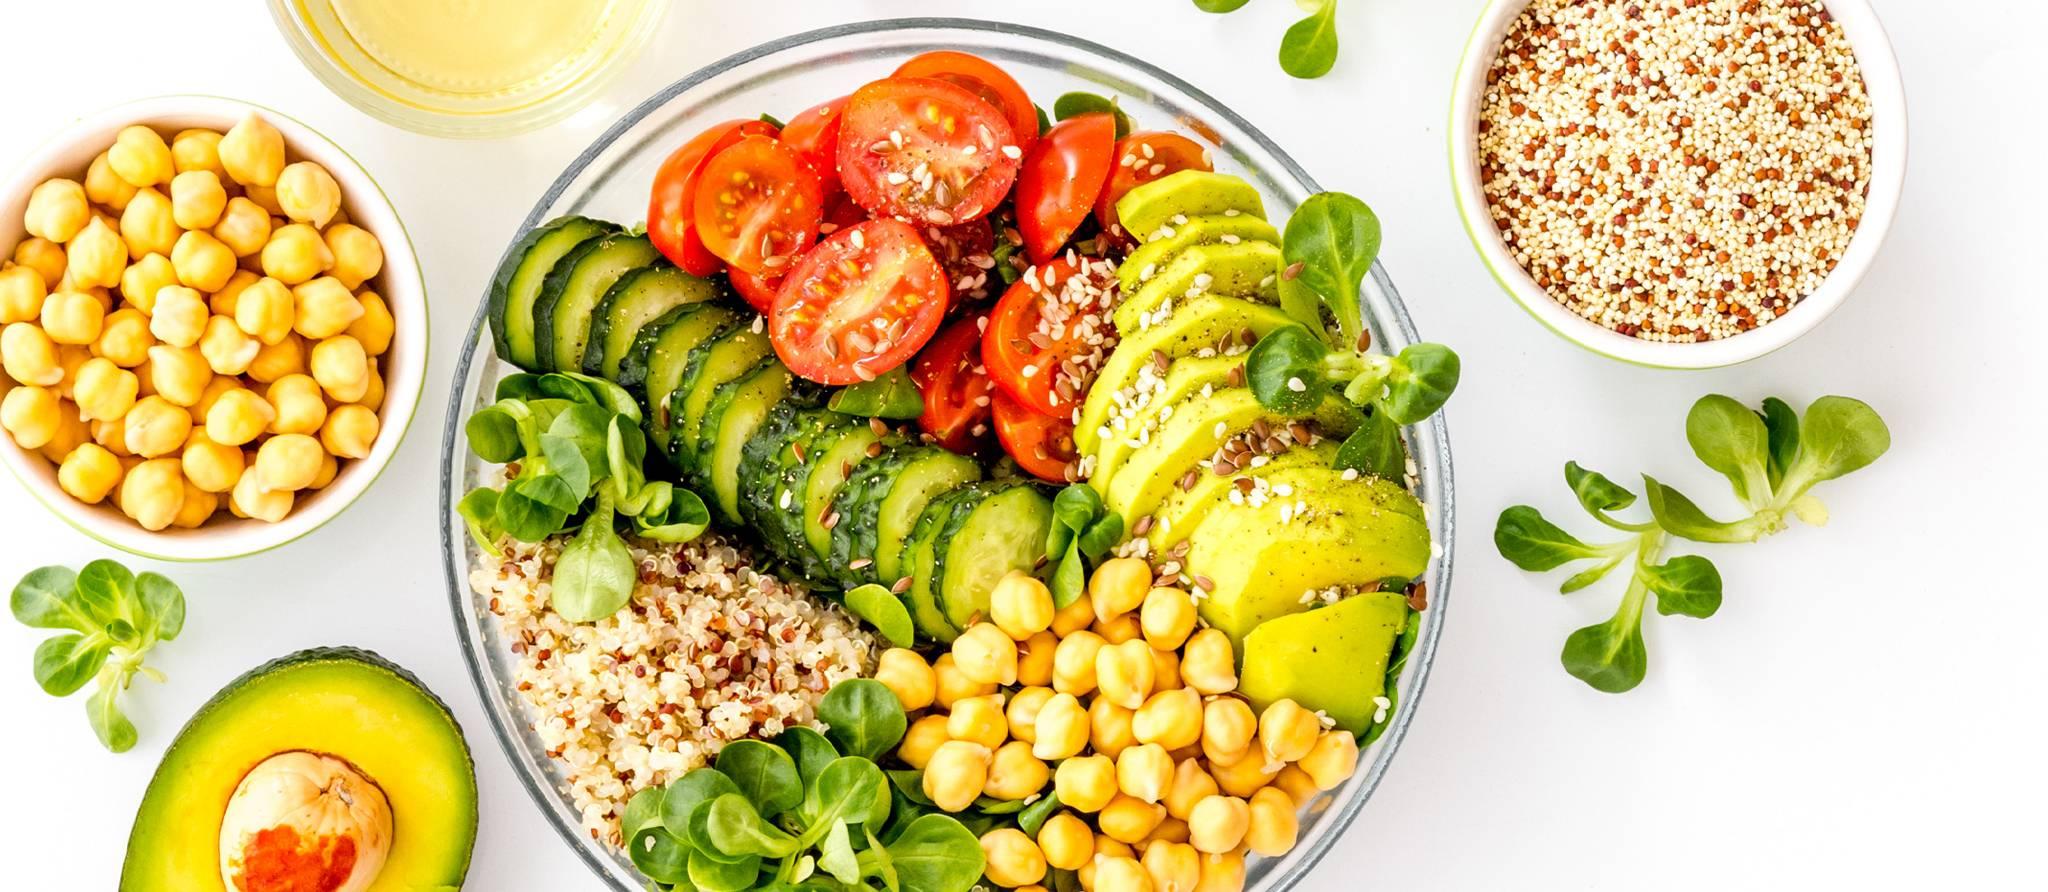 empreinte-carbone-aliments